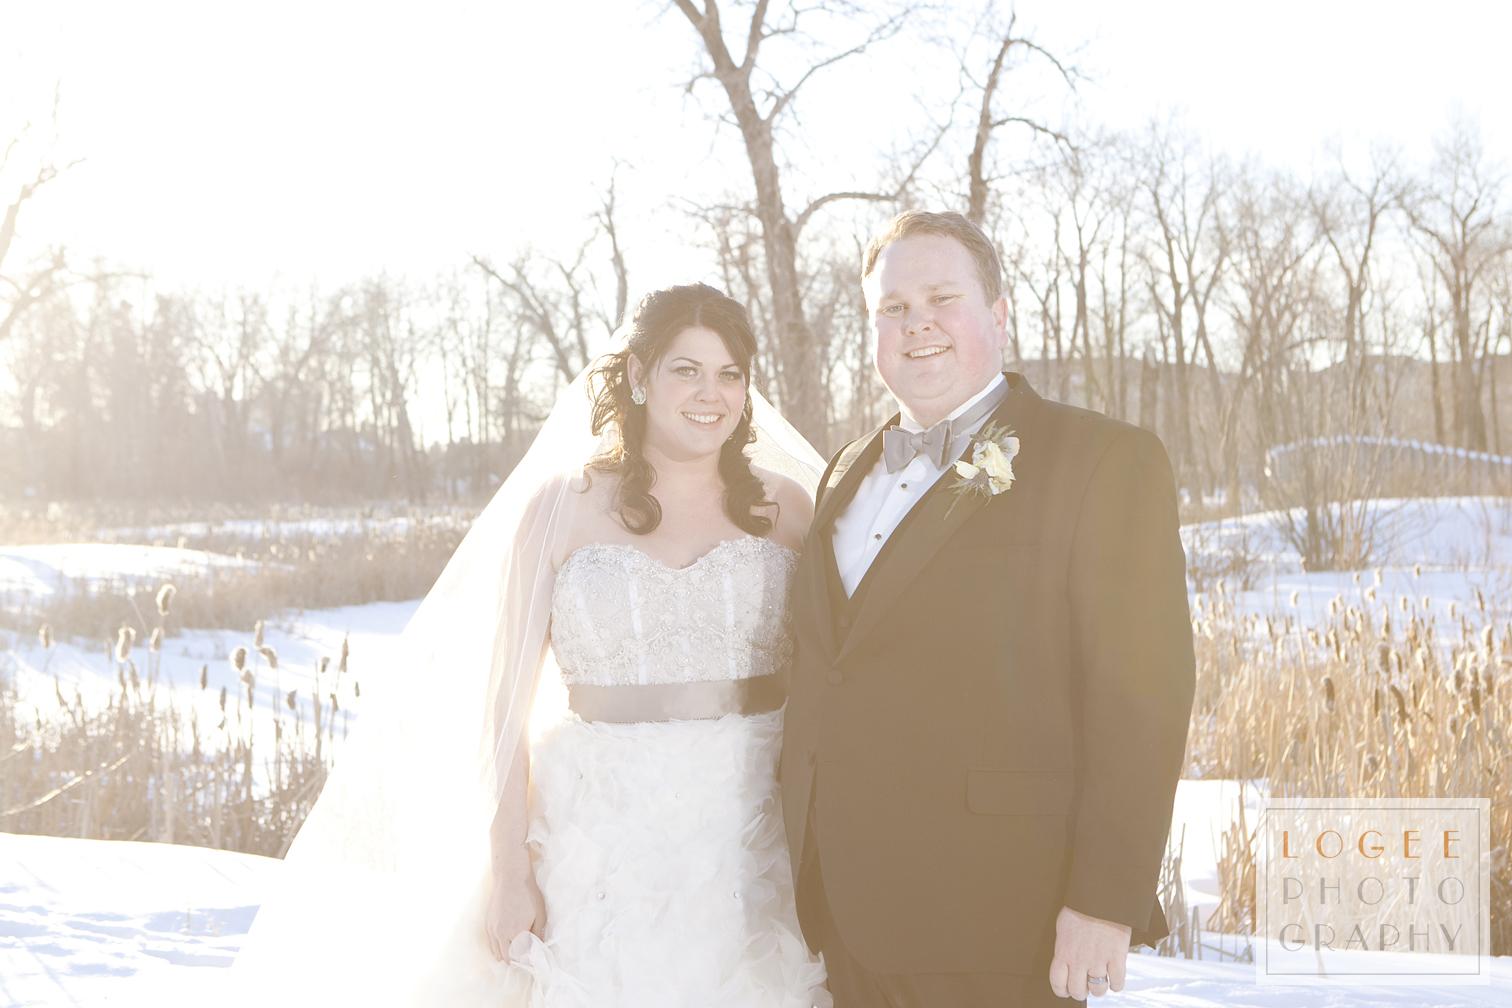 McIntosh-Burns Wedding - 6945Aw